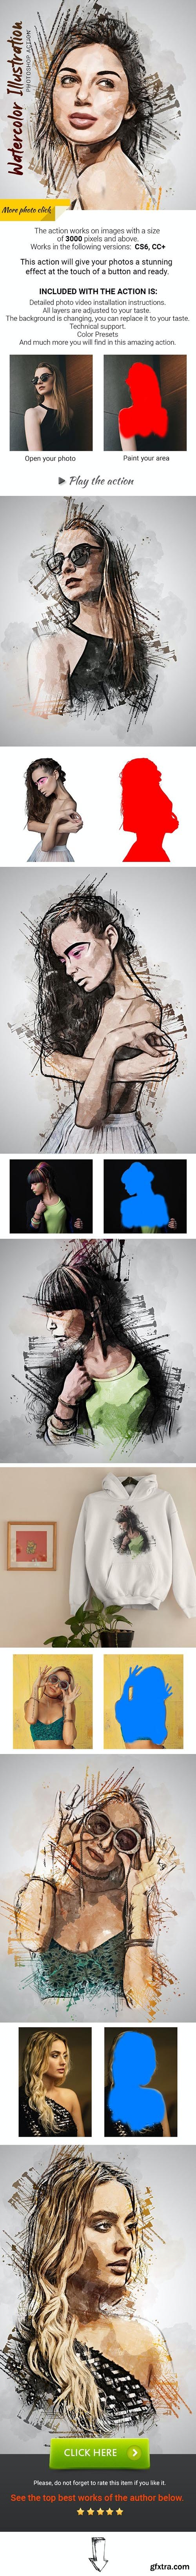 GraphicRiver - Watercolor Illustration Photoshop Action 28803661